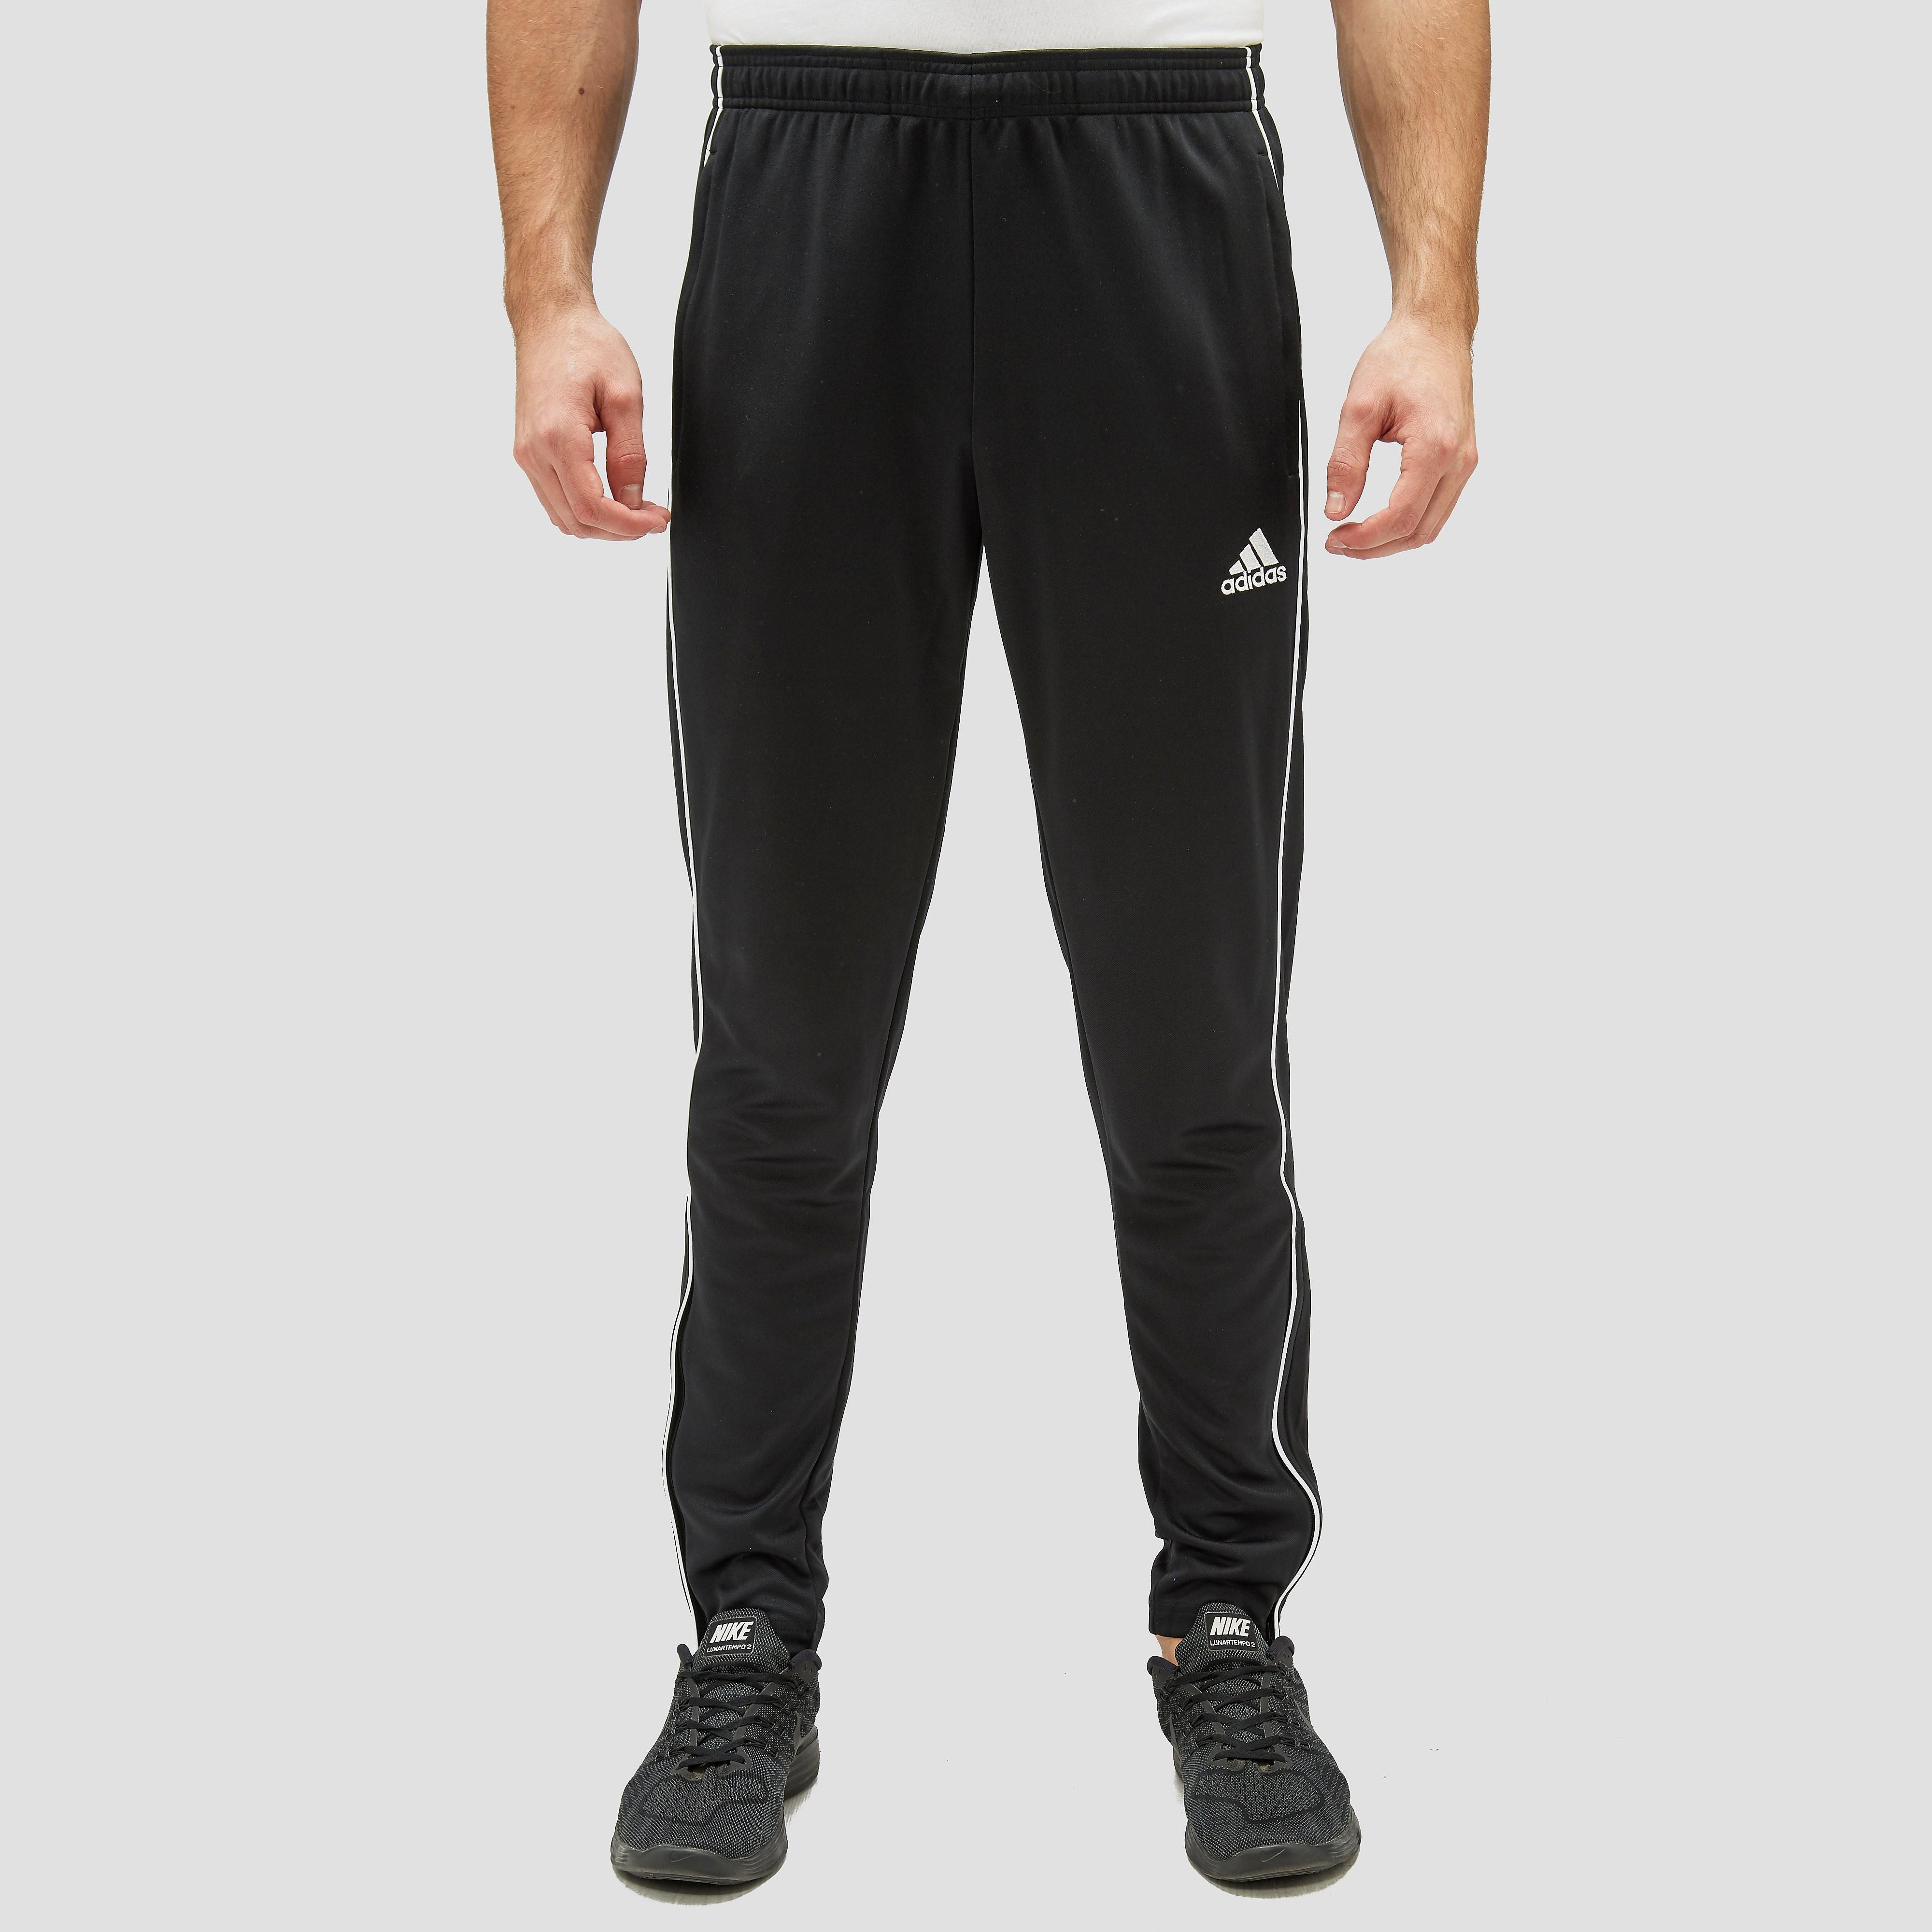 Core 18 Trainingsbroek Zwart Heren. Size XXL